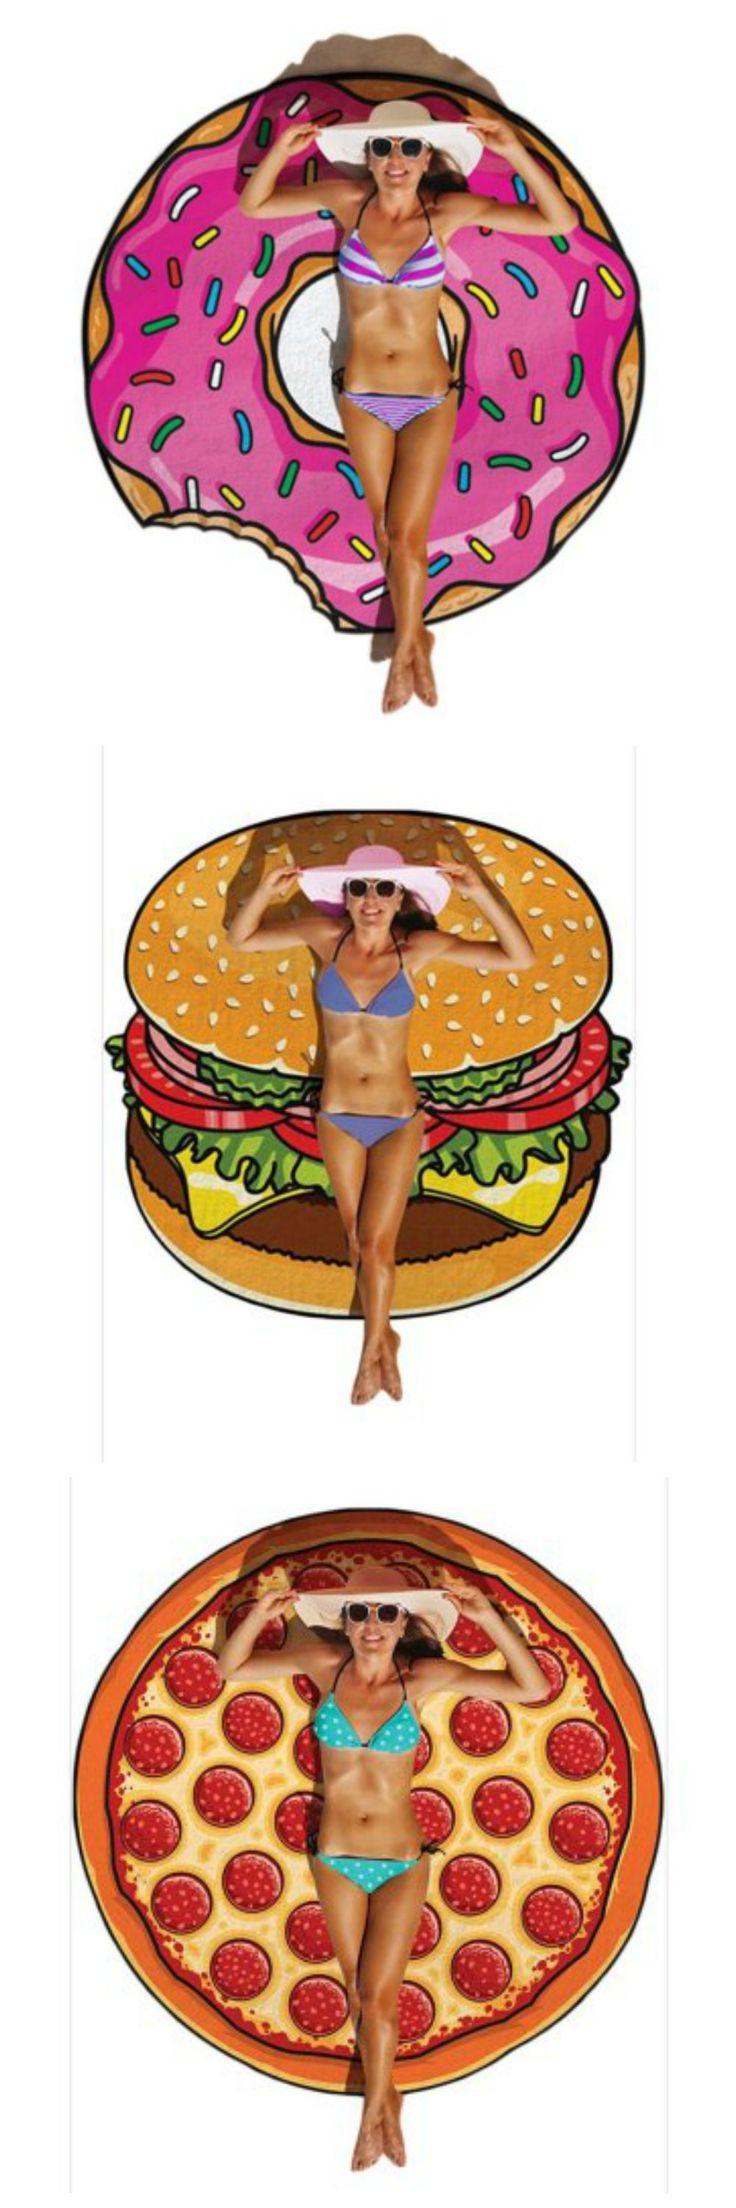 Donut Towel | Hamburger Towel | Pizza Towel | Round Towel